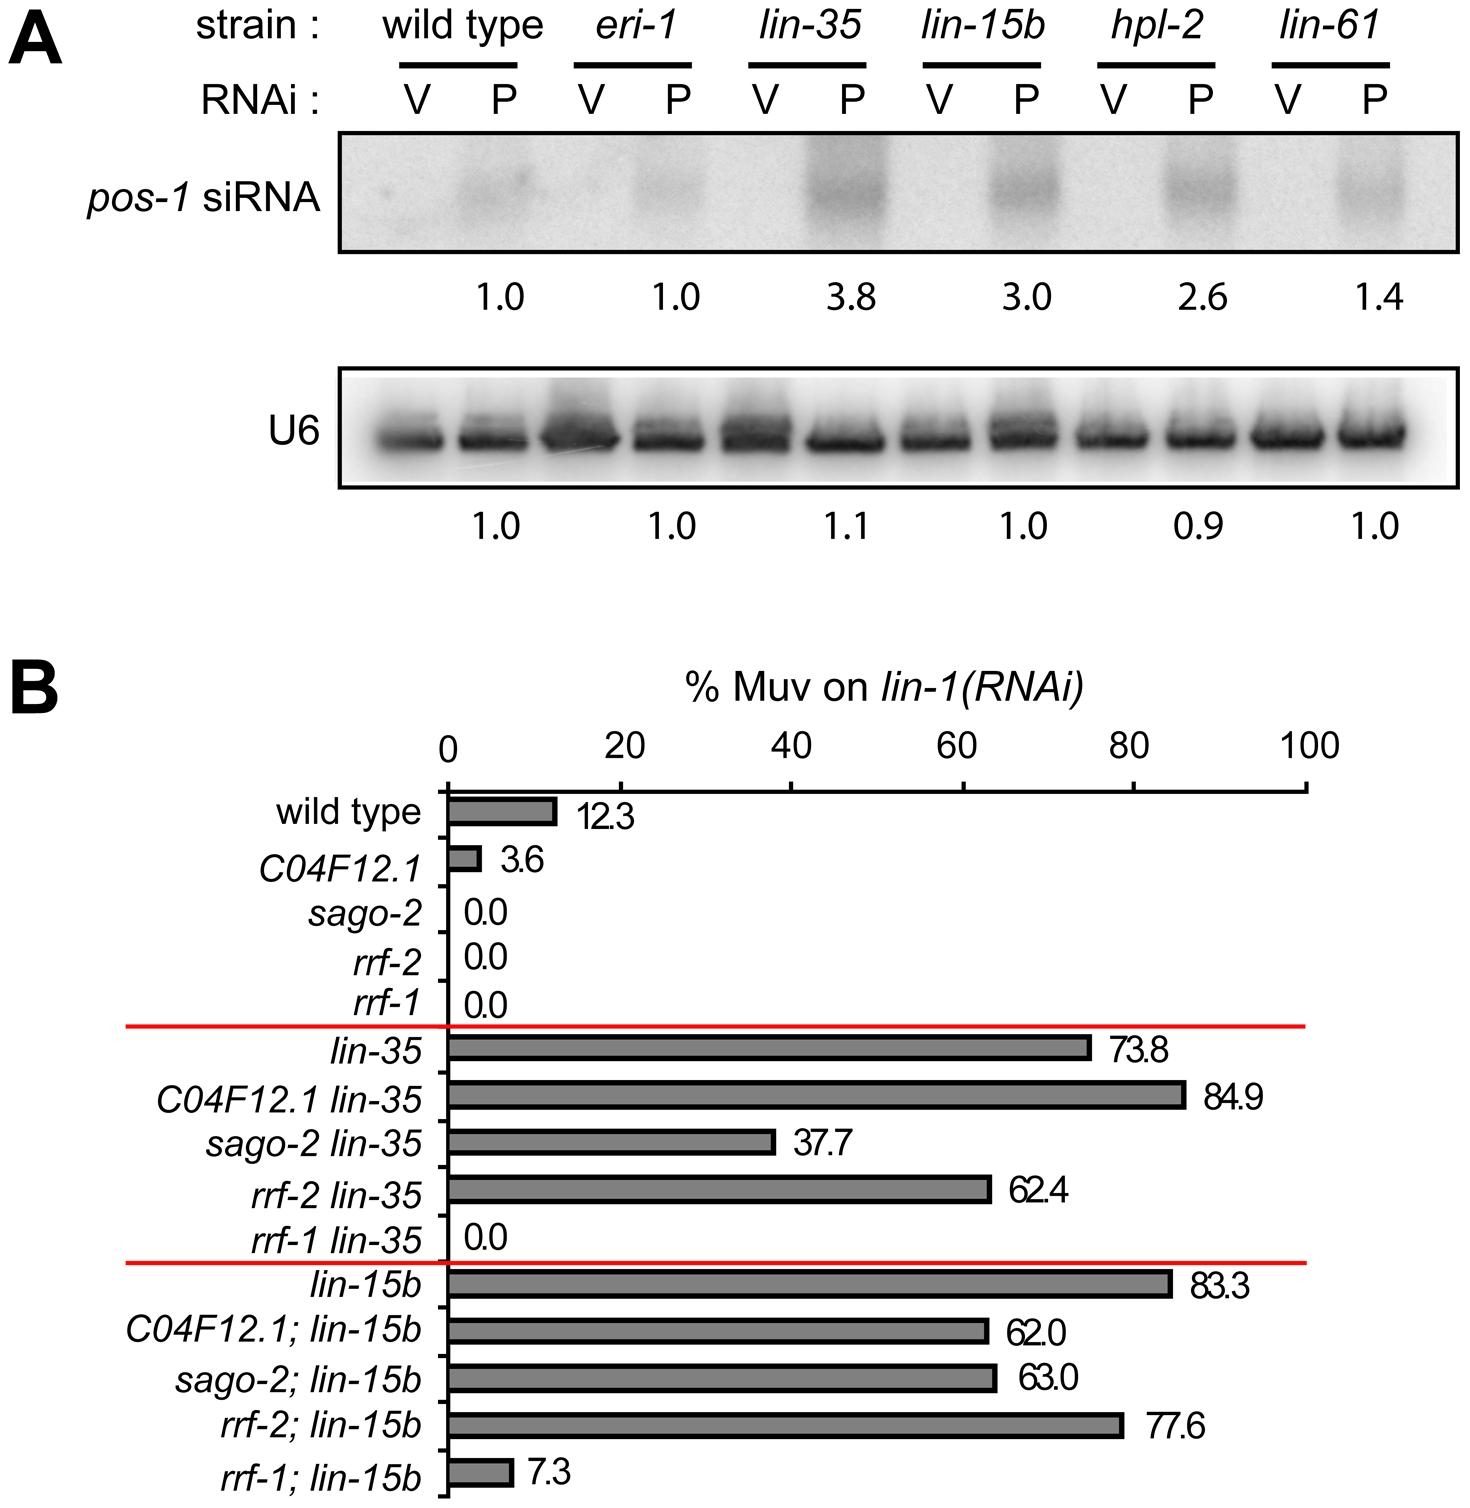 Transcriptional misregulations partially contribute to the enhanced RNAi response of synMuv B mutants.